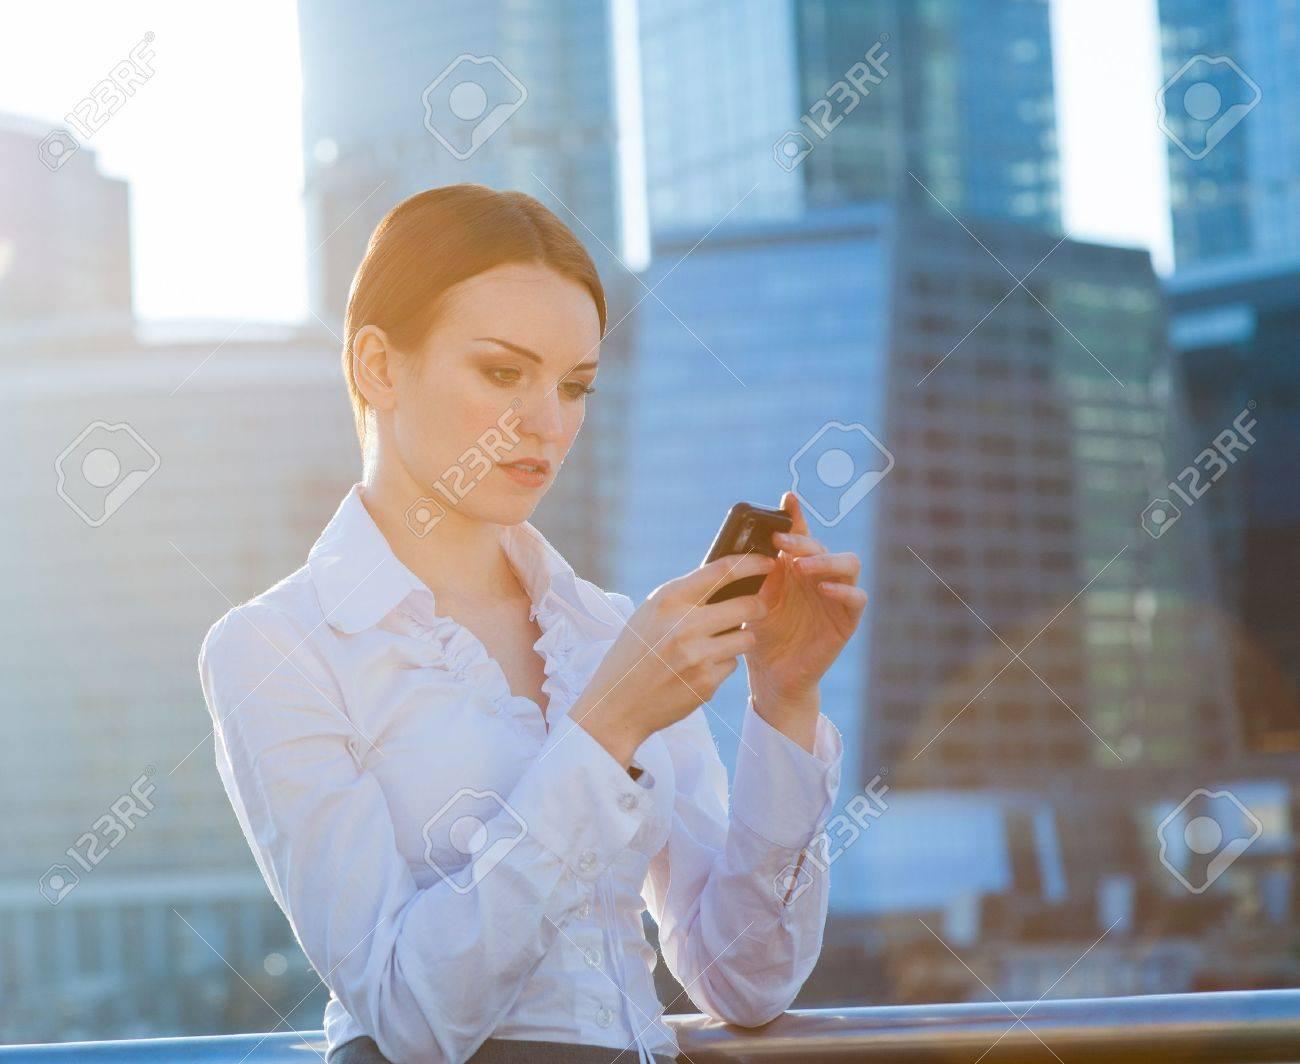 Business woman using smartphone. Sun beams, lens flare - 19203115